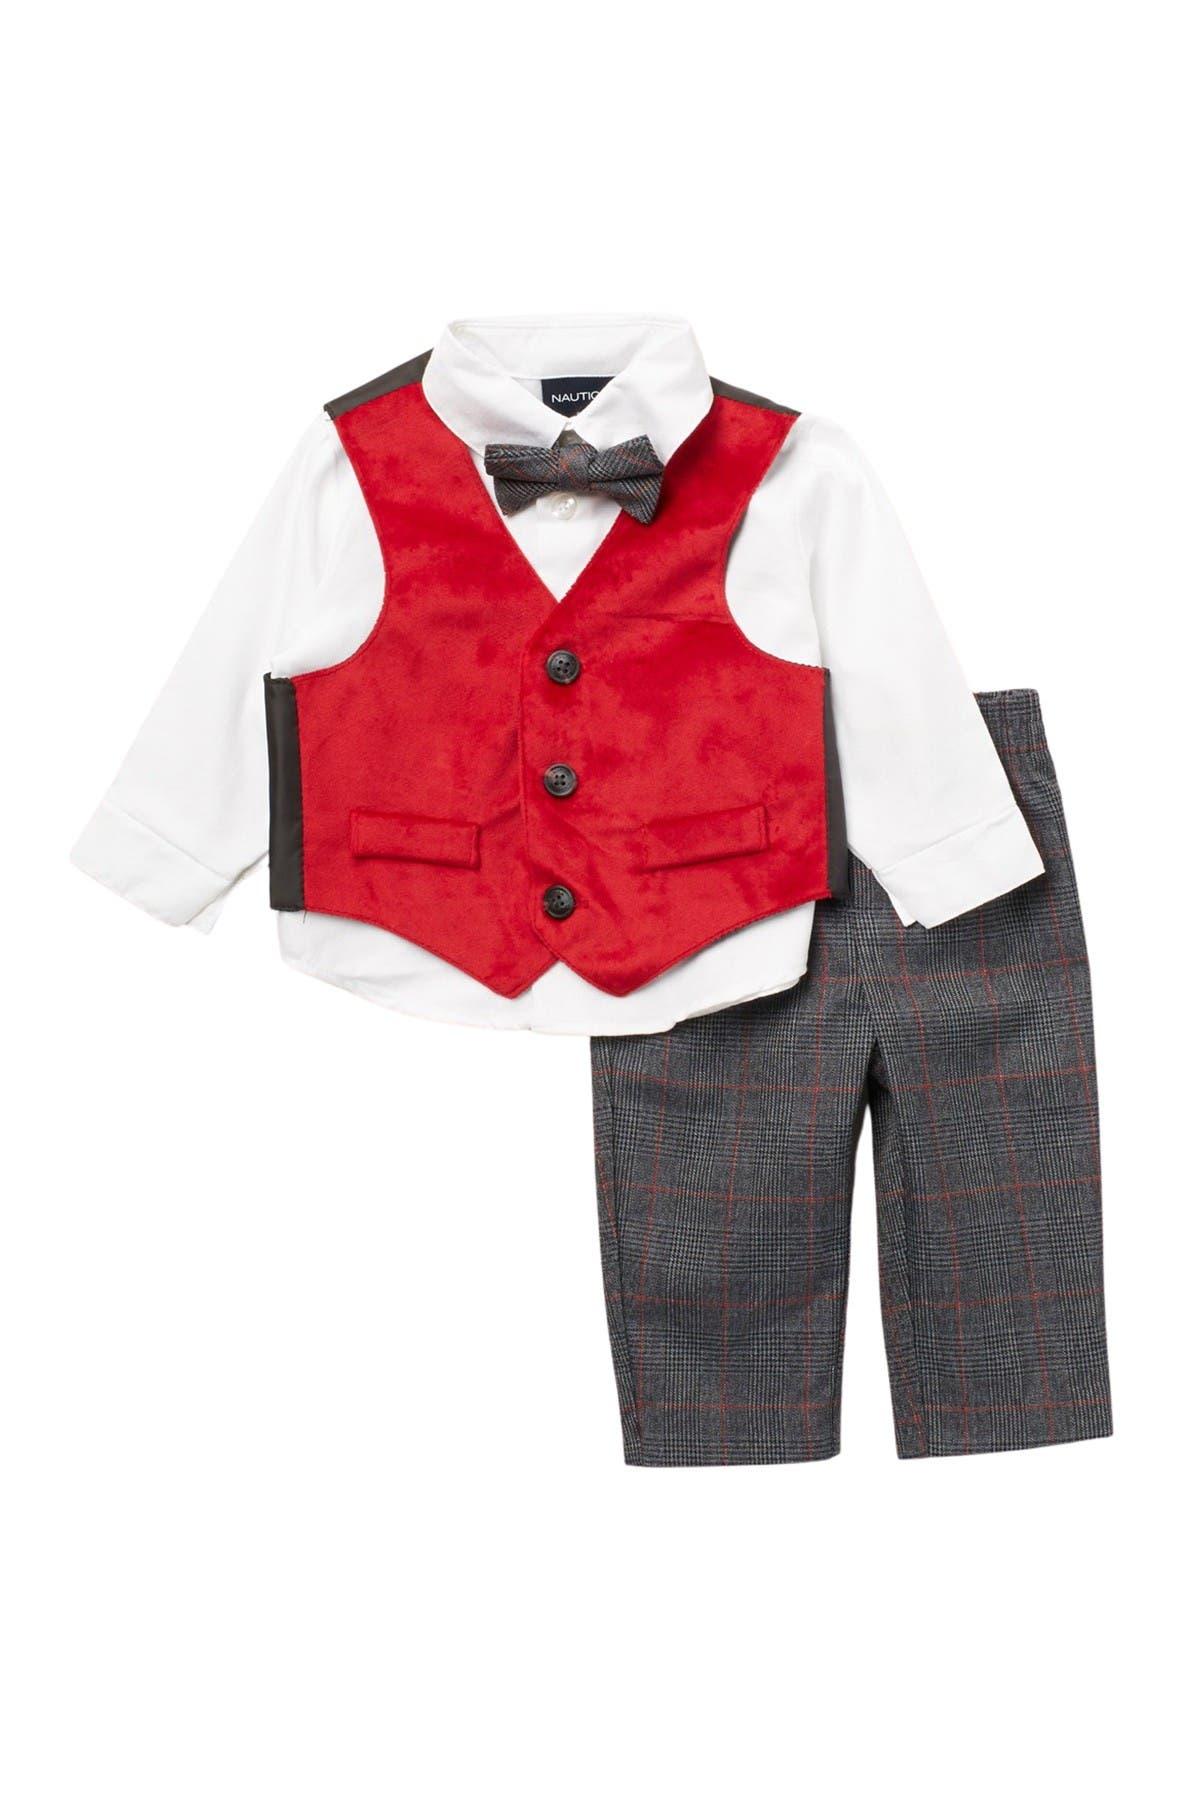 Image of Nautica Holiday Red Velvet Vest 3-Piece Set